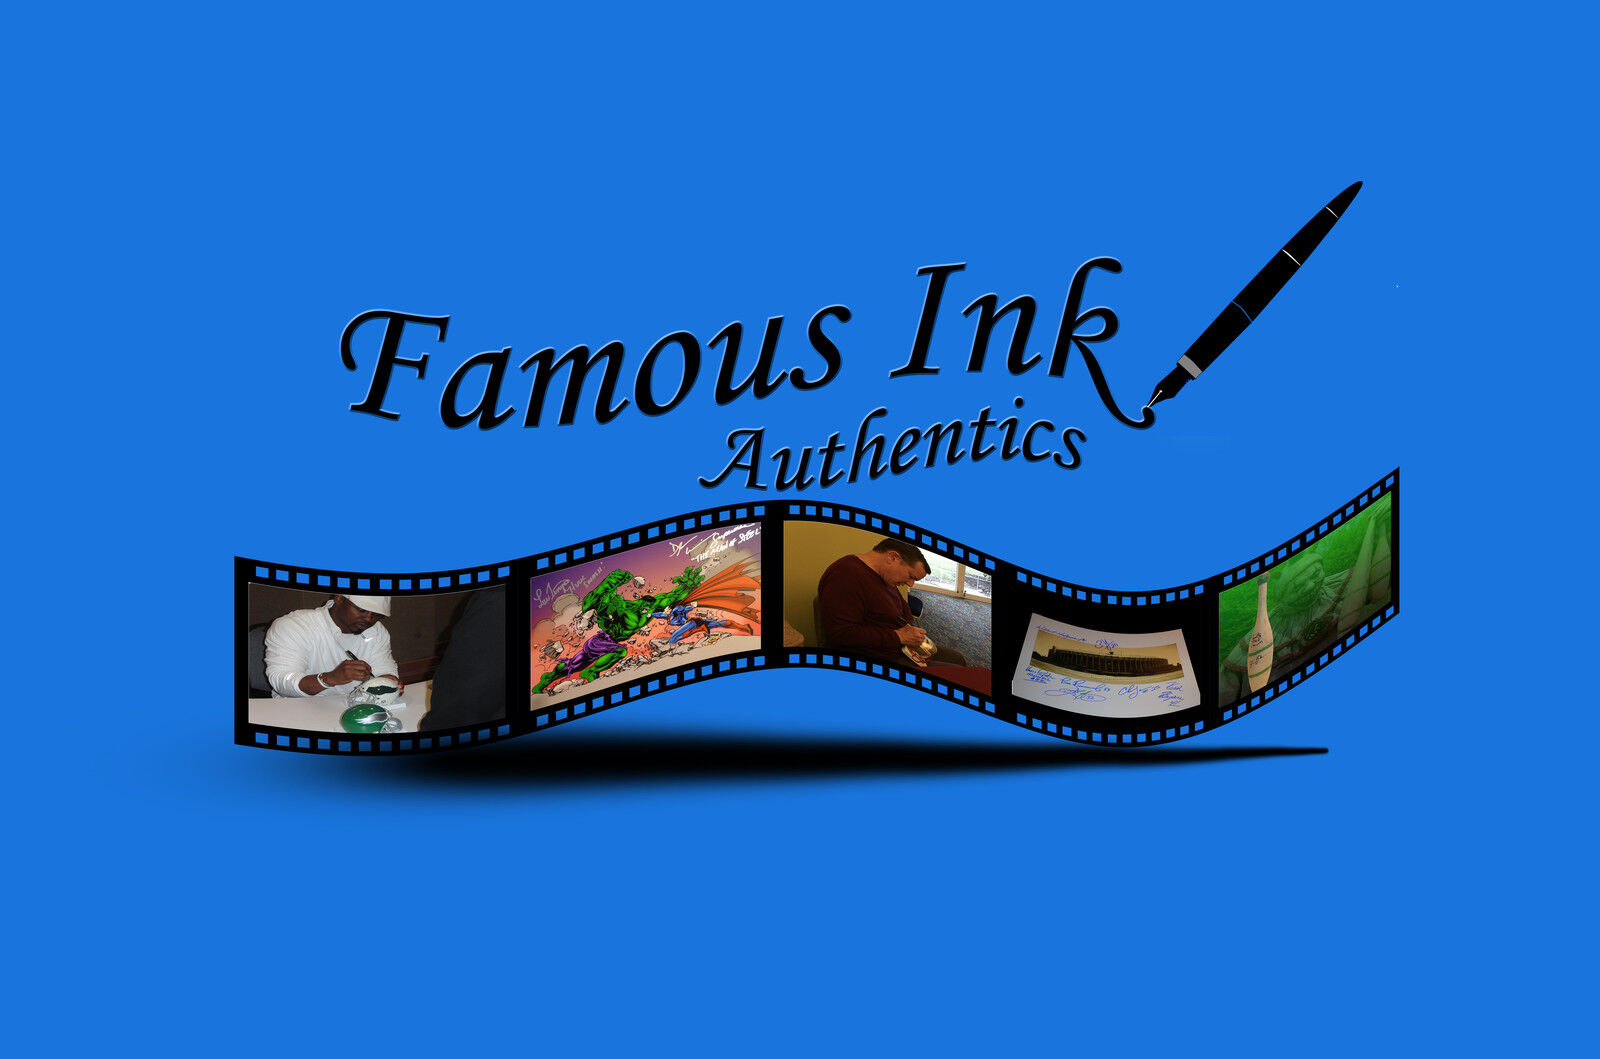 famousinkauthentics